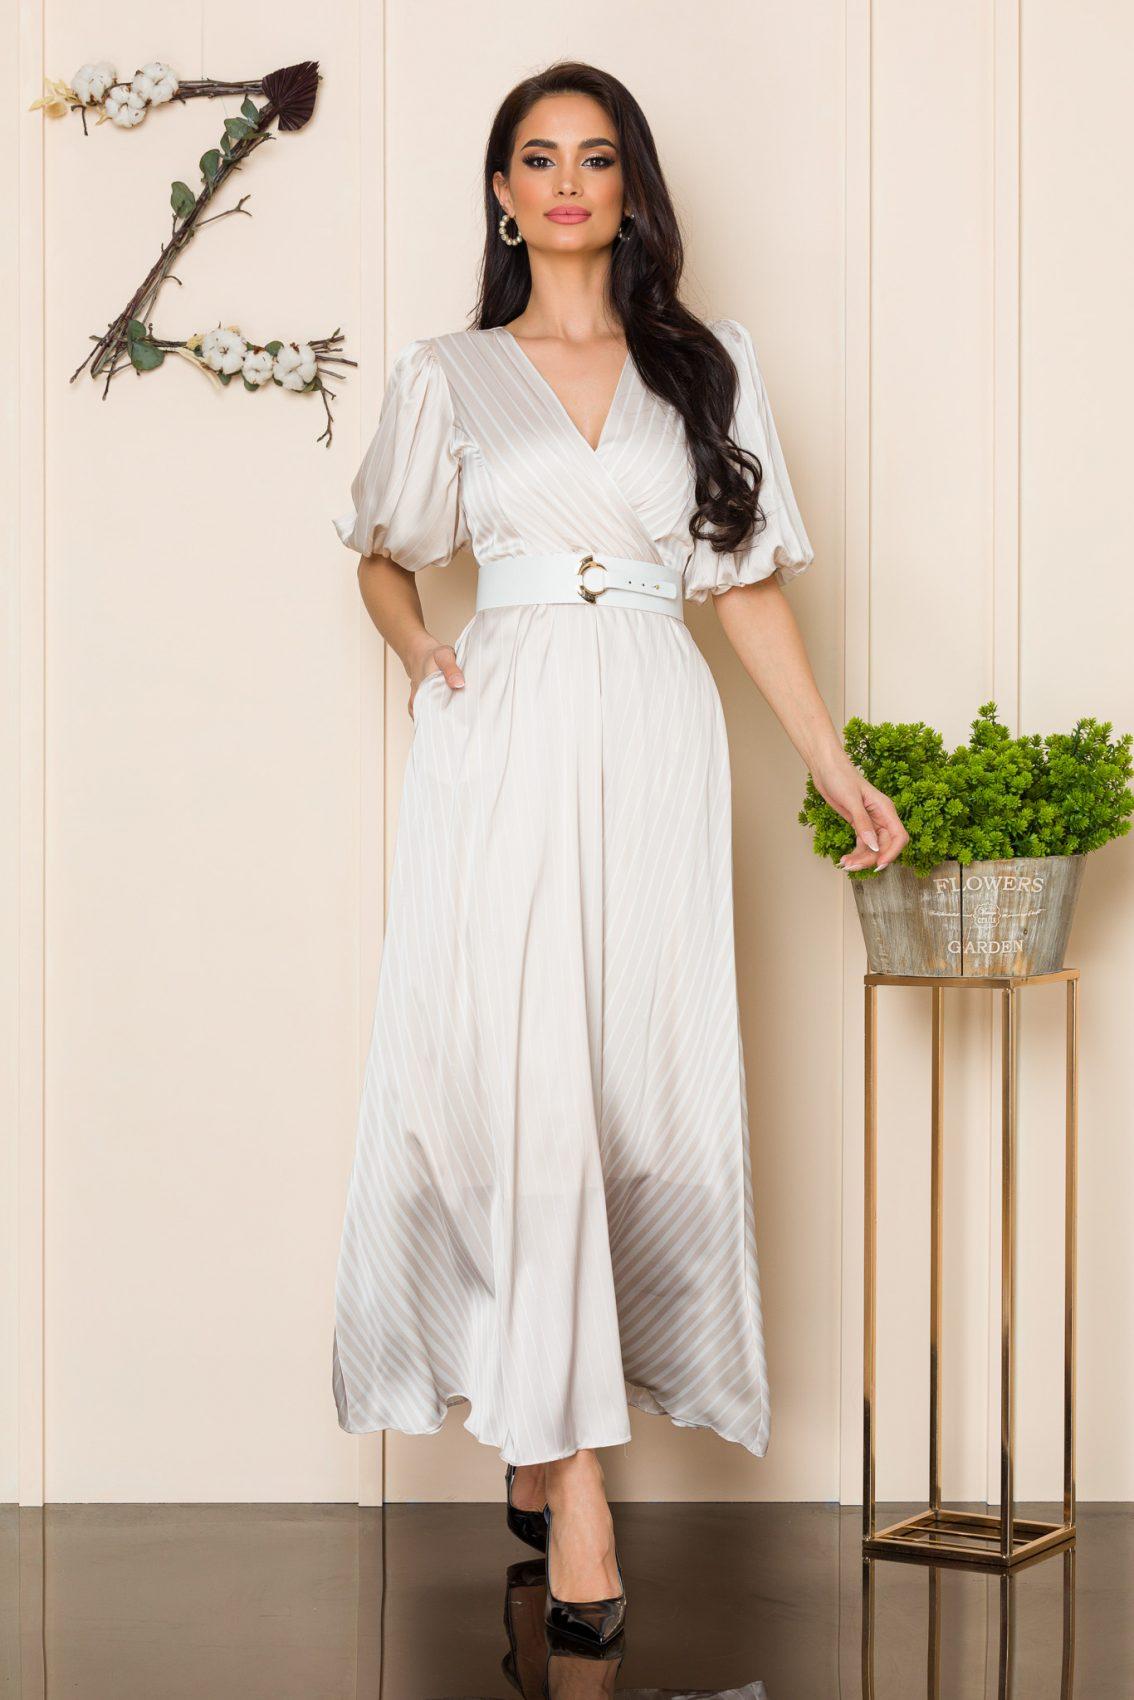 Nude Φόρεμα Με Ζώνη Soraya A116 1